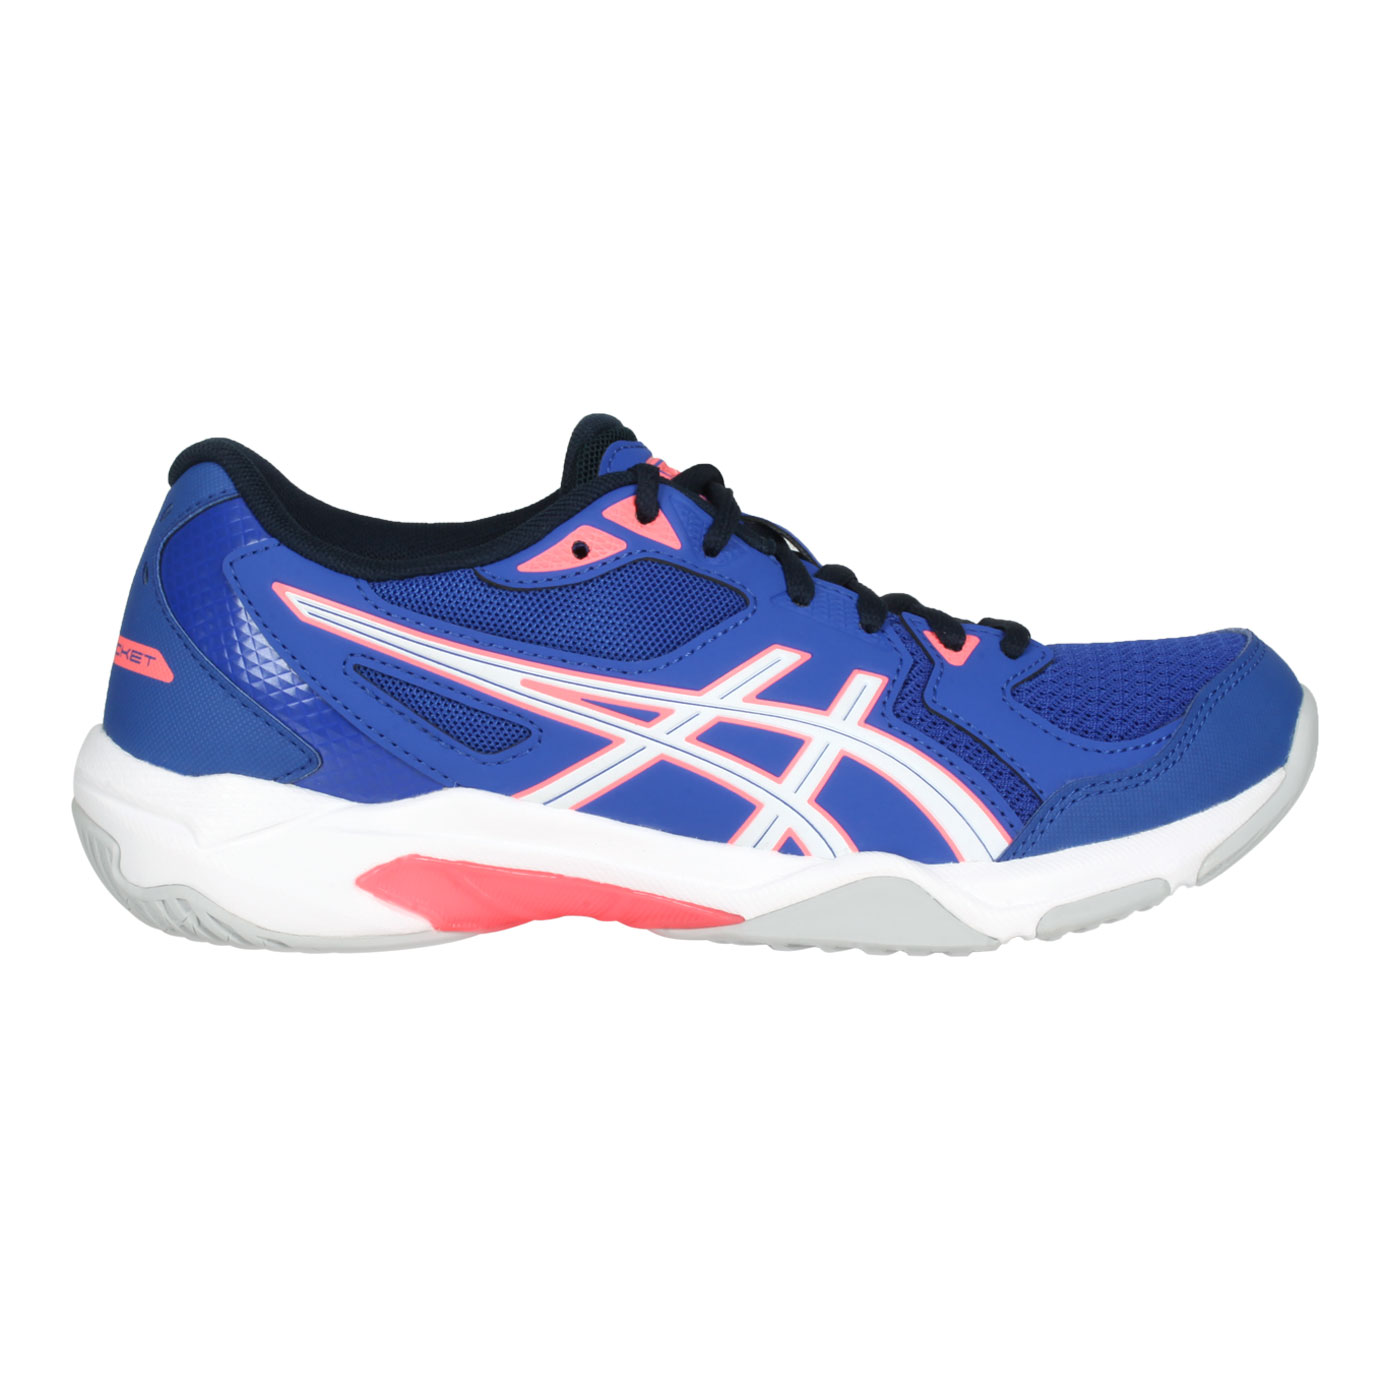 ASICS 女款排羽球鞋  @GEL-ROCKET 10@1072A056-402 - 深藍白粉